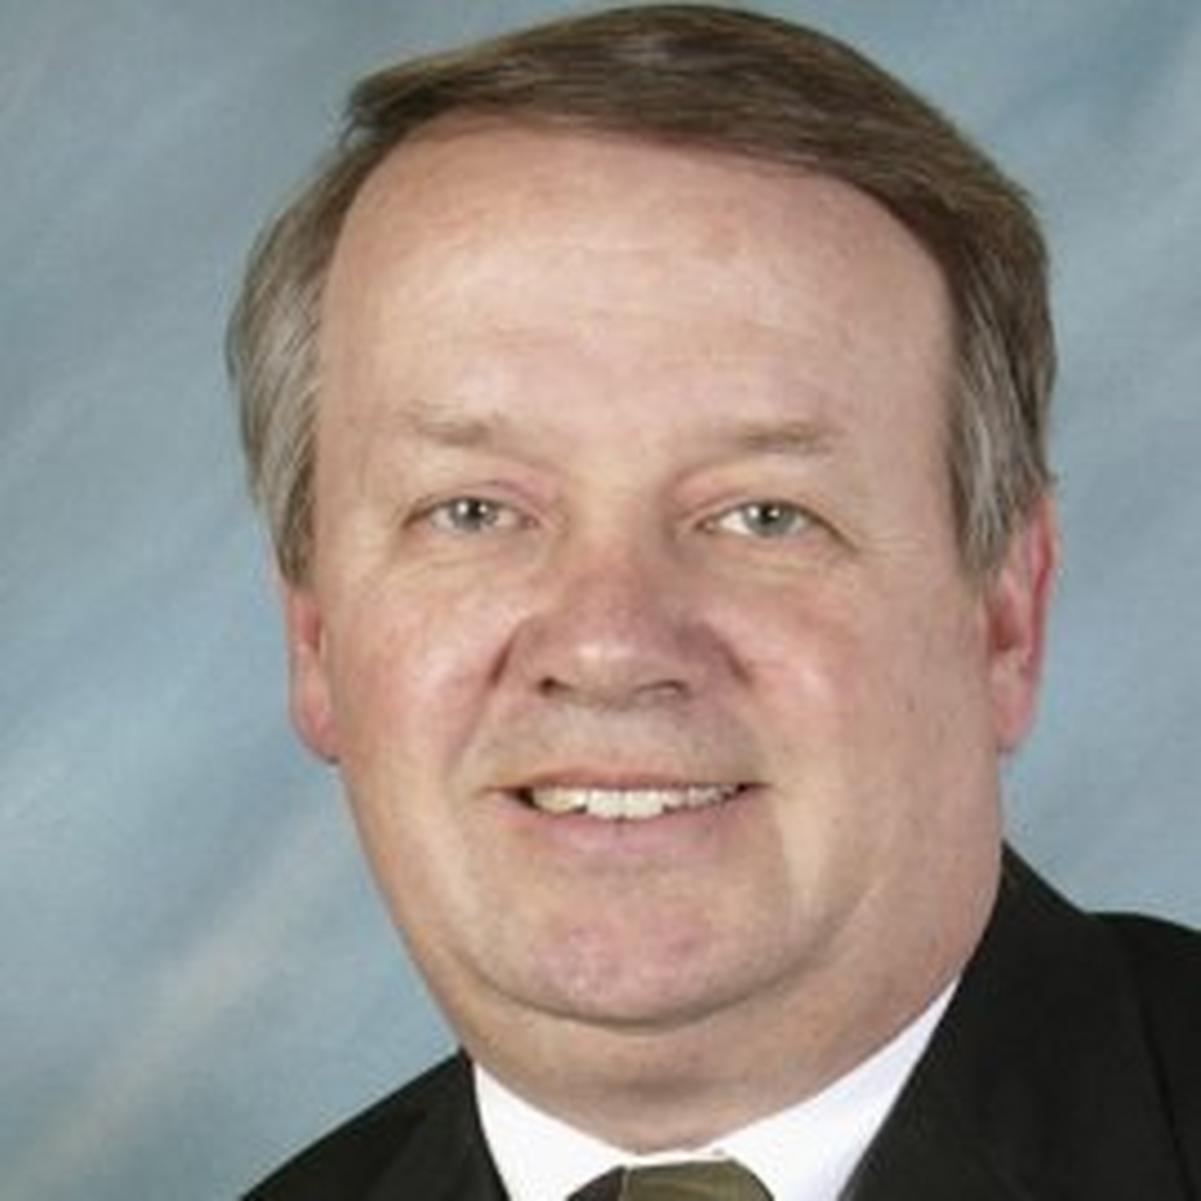 Terry L. Booton